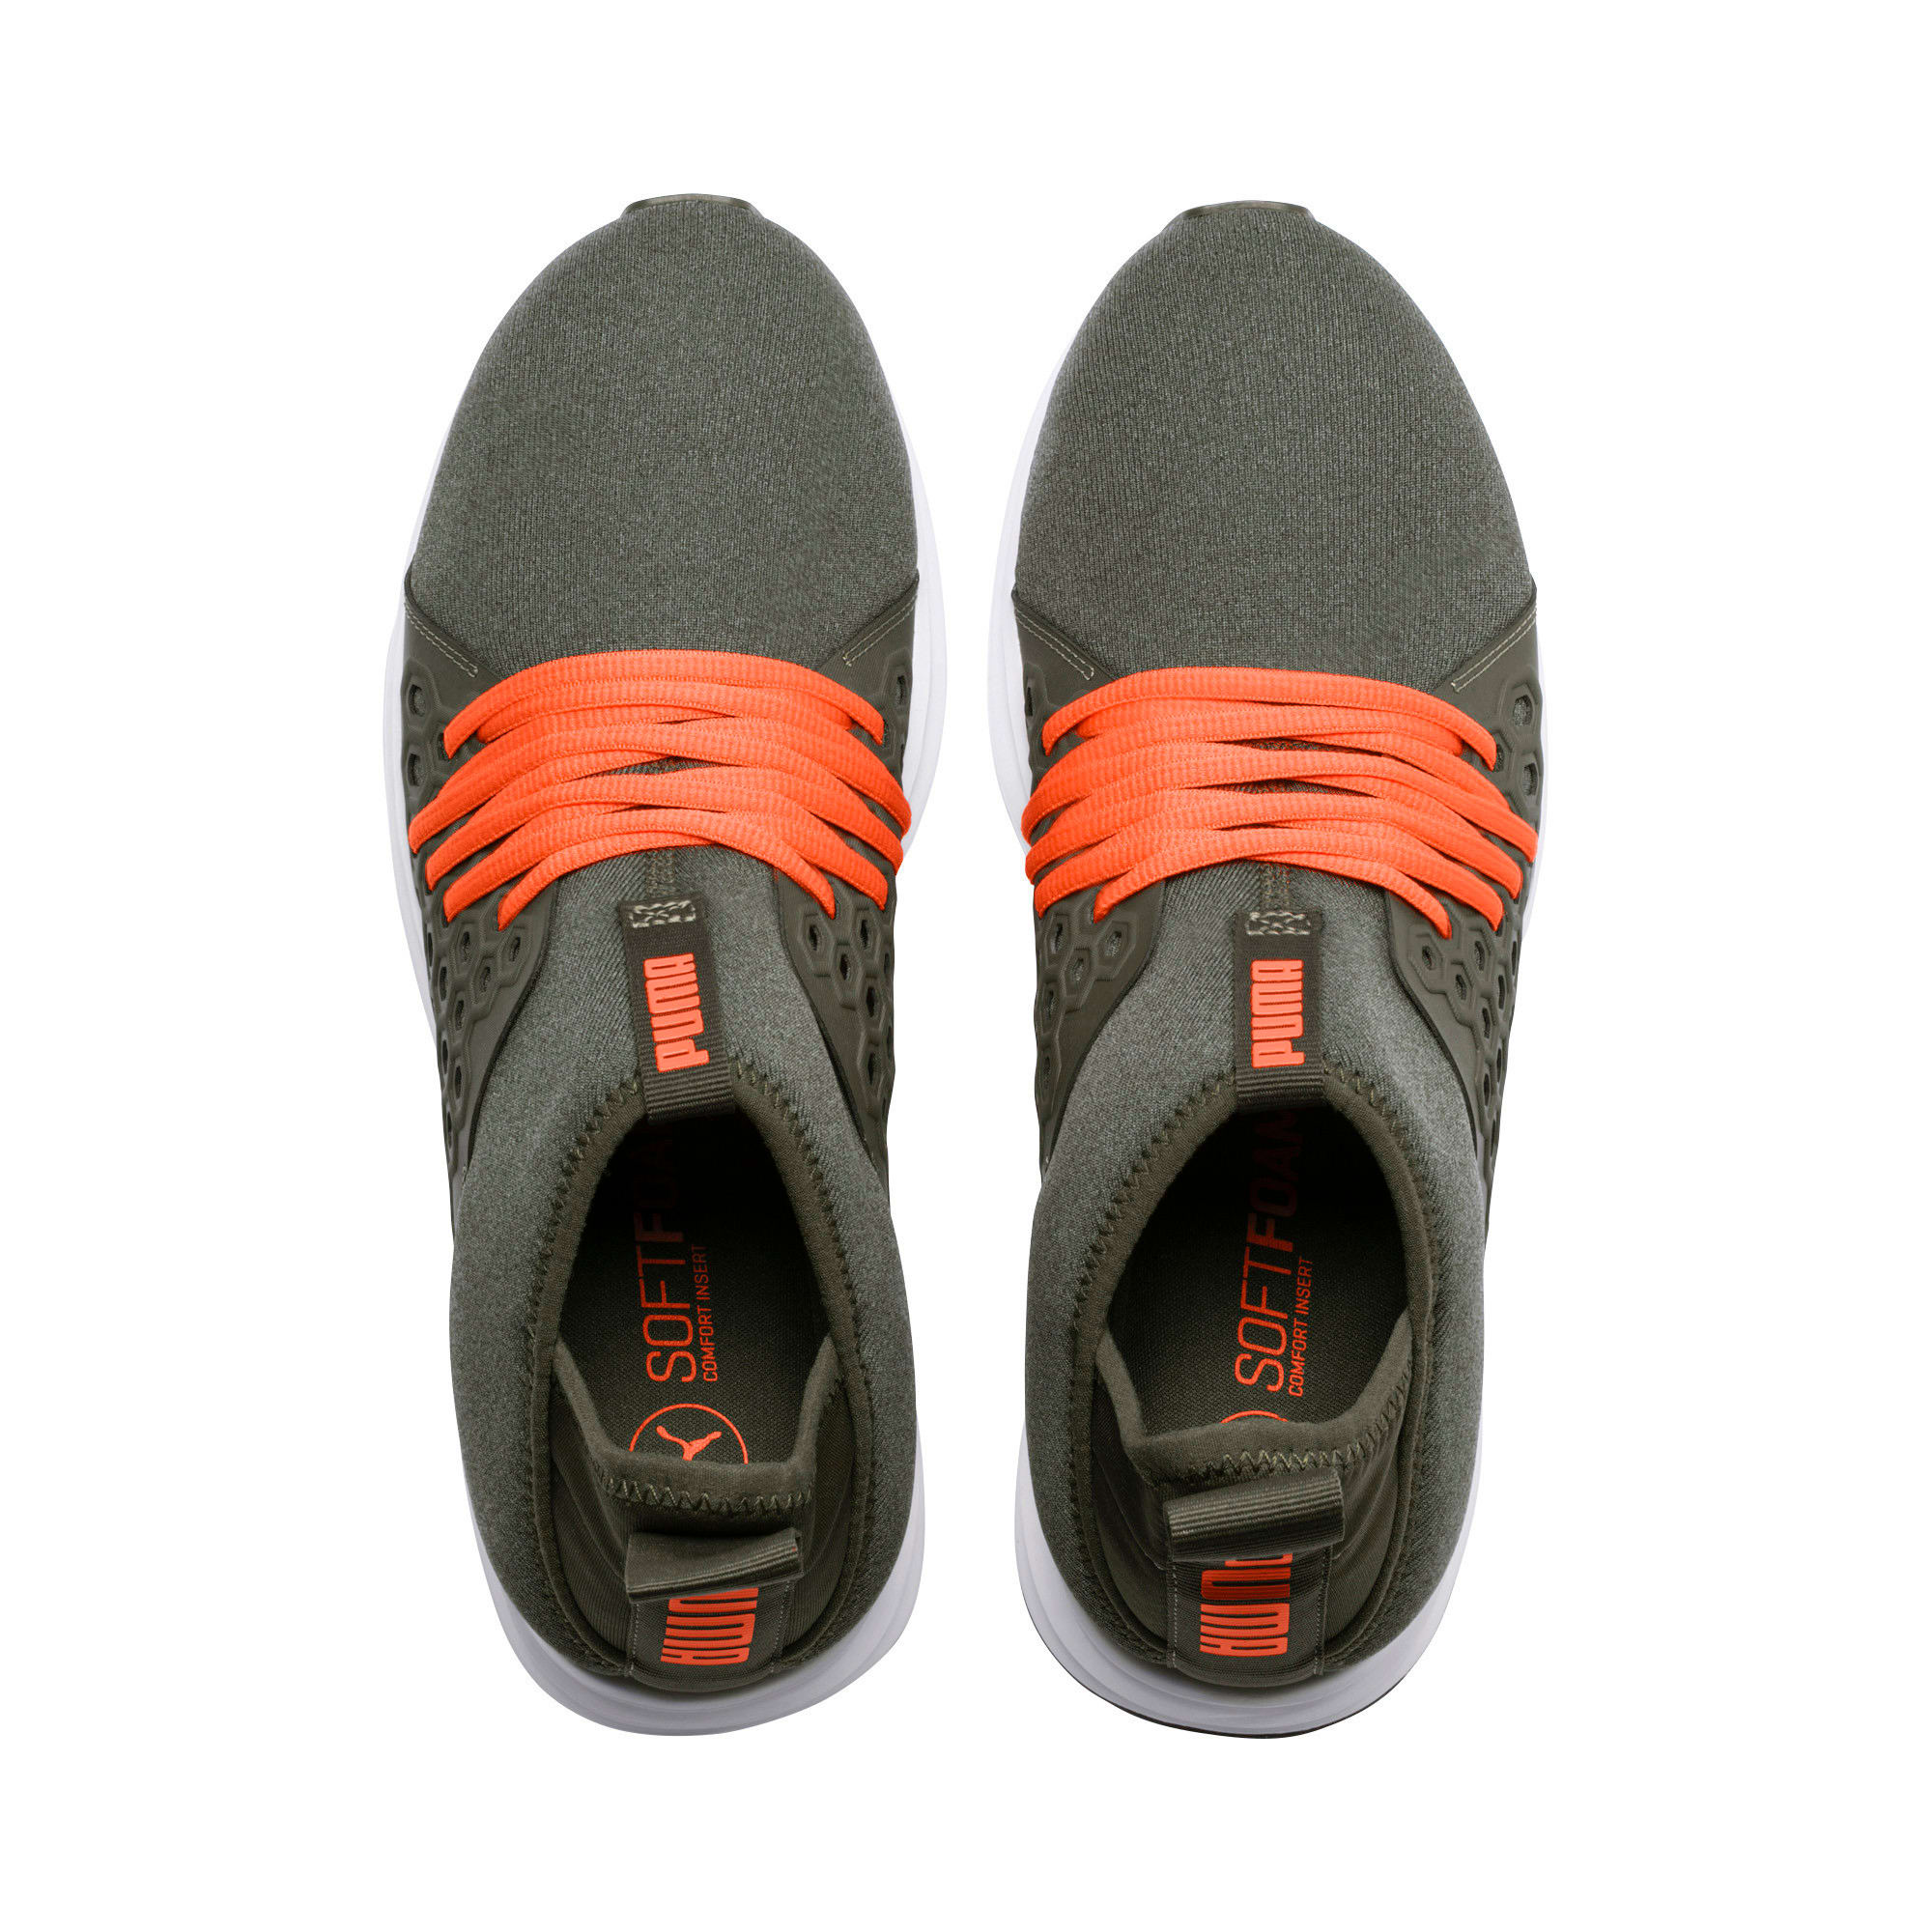 Thumbnail 6 of Enzo NETFIT Mid Men's Training Shoes, Forest Night-Firecracker, medium-IND